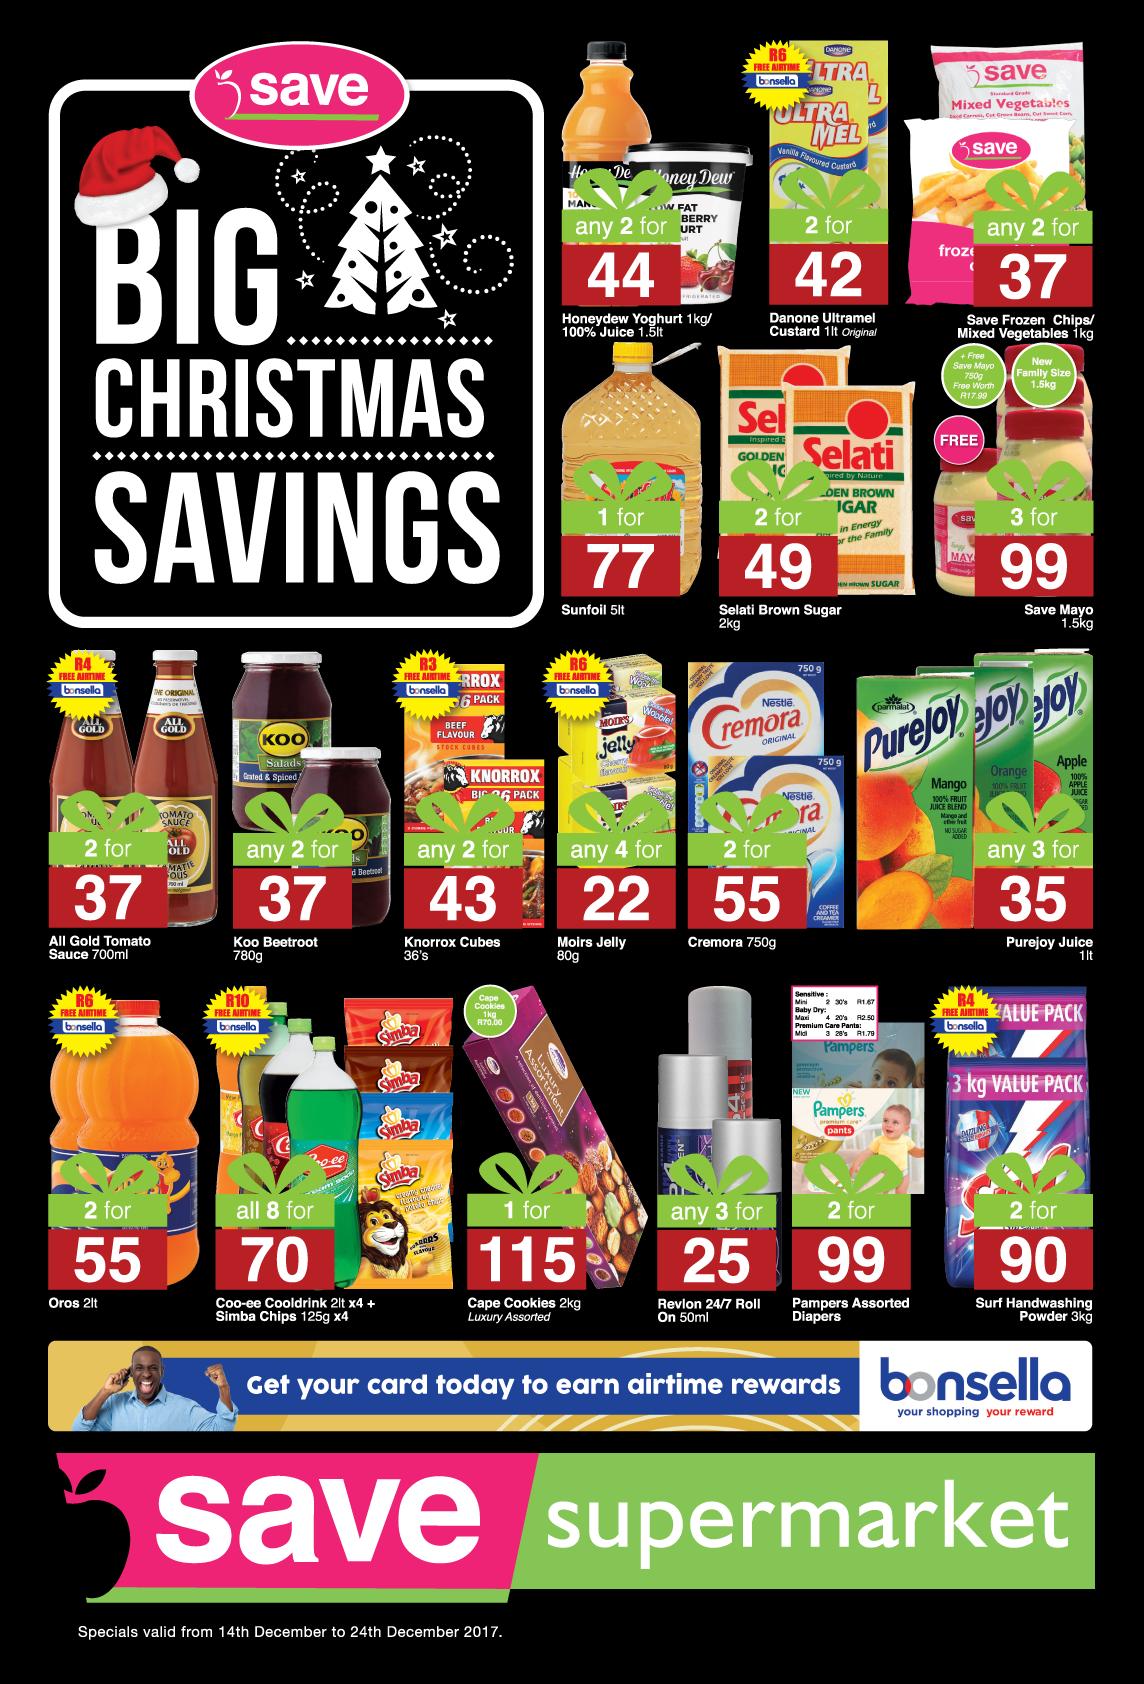 Save Supermarket Howick/Dalton Specials -  until 24th December 2017